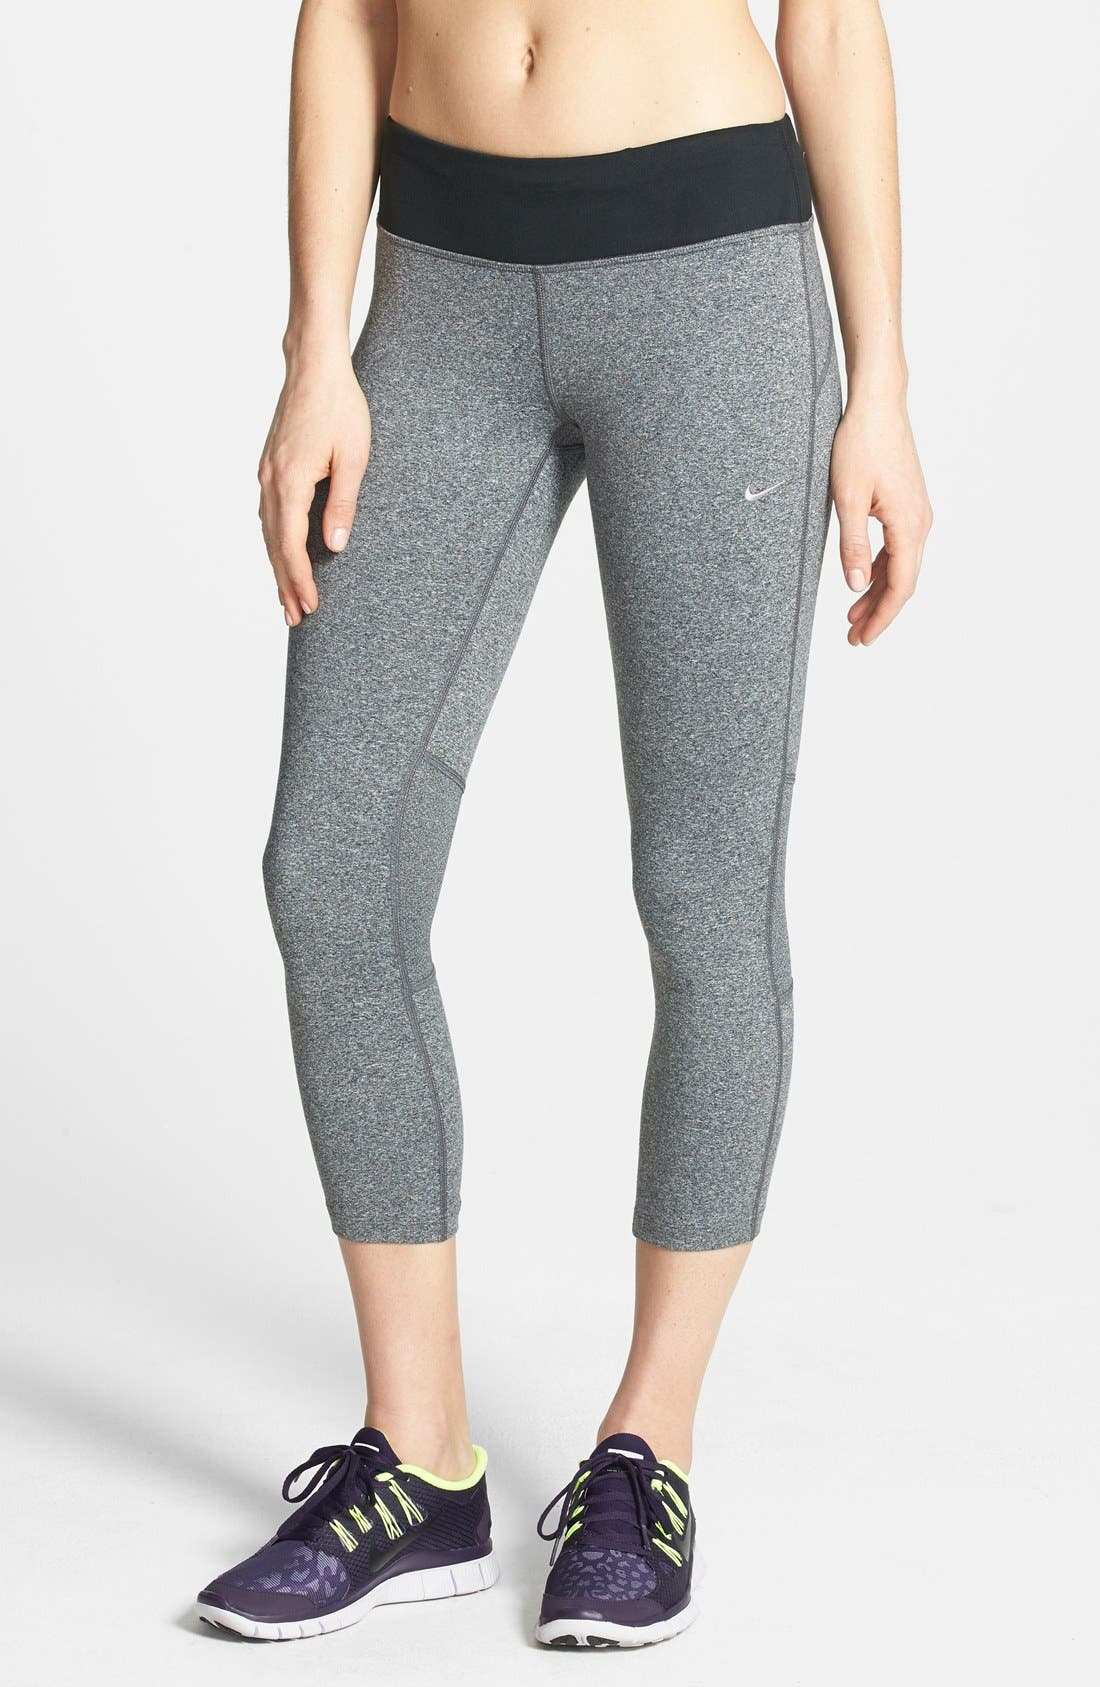 Main Image - Nike 'Epic Run' Crop Tights